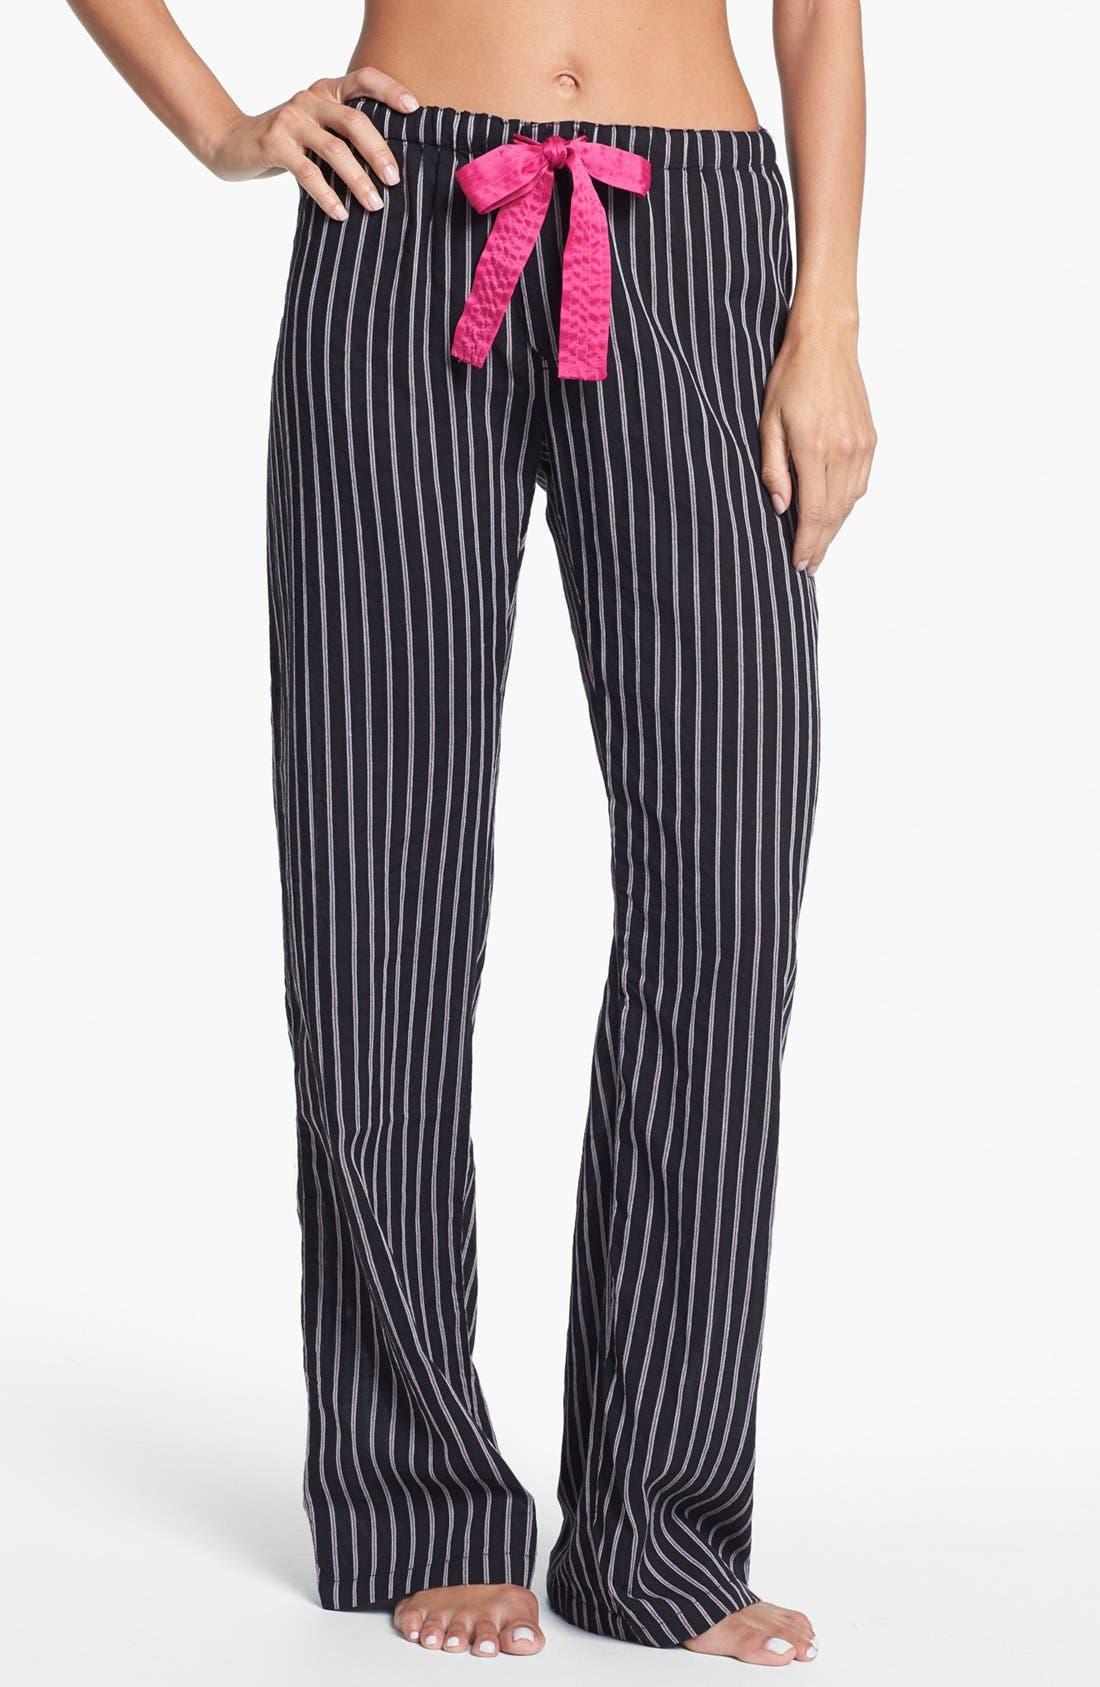 Alternate Image 1 Selected - PJ Salvage 'Pop of Pink' Lounge Pants